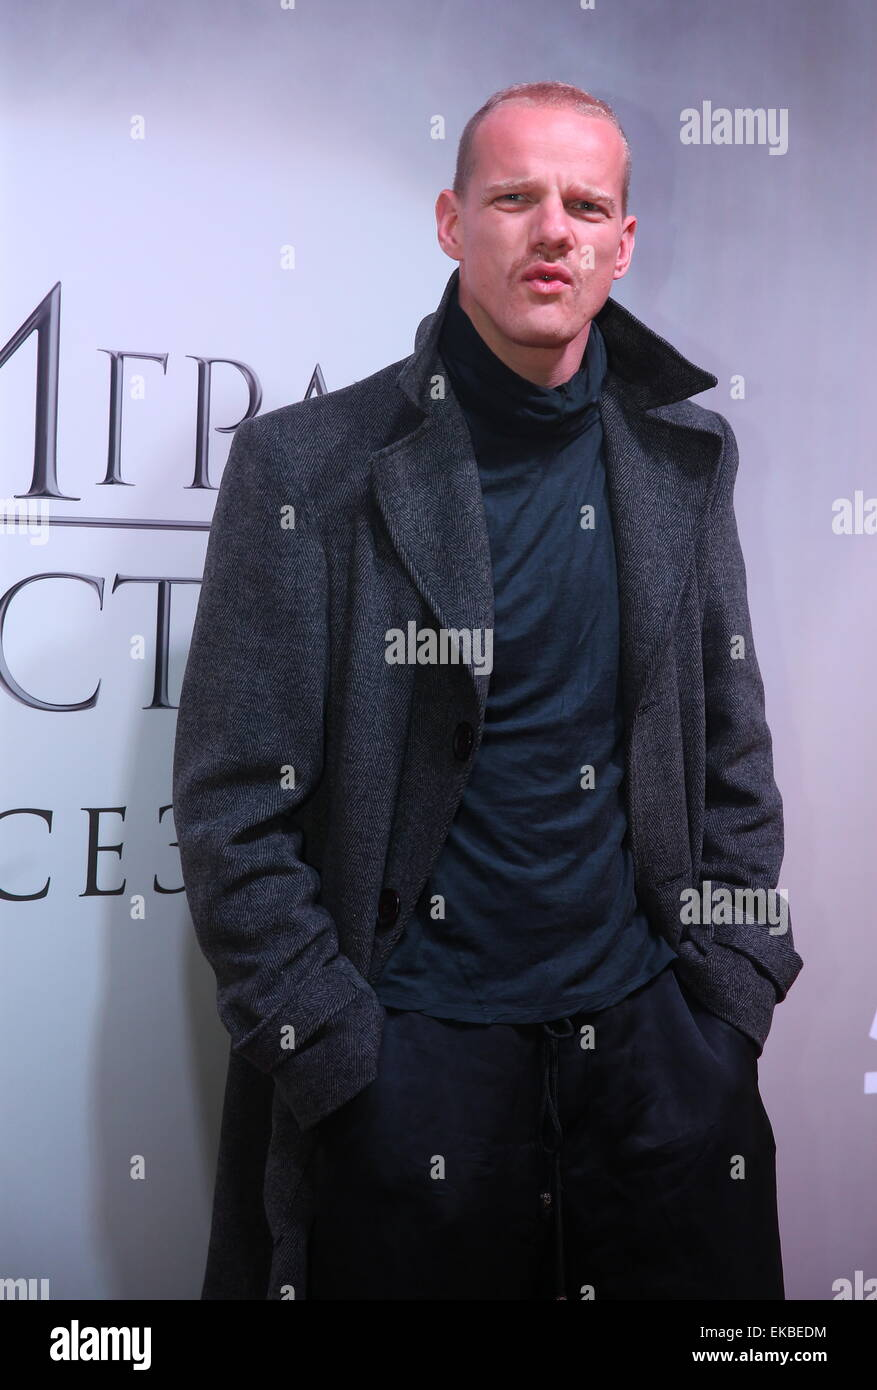 Russian actor in the Game of Thrones. Yury Kolokolnikov 38